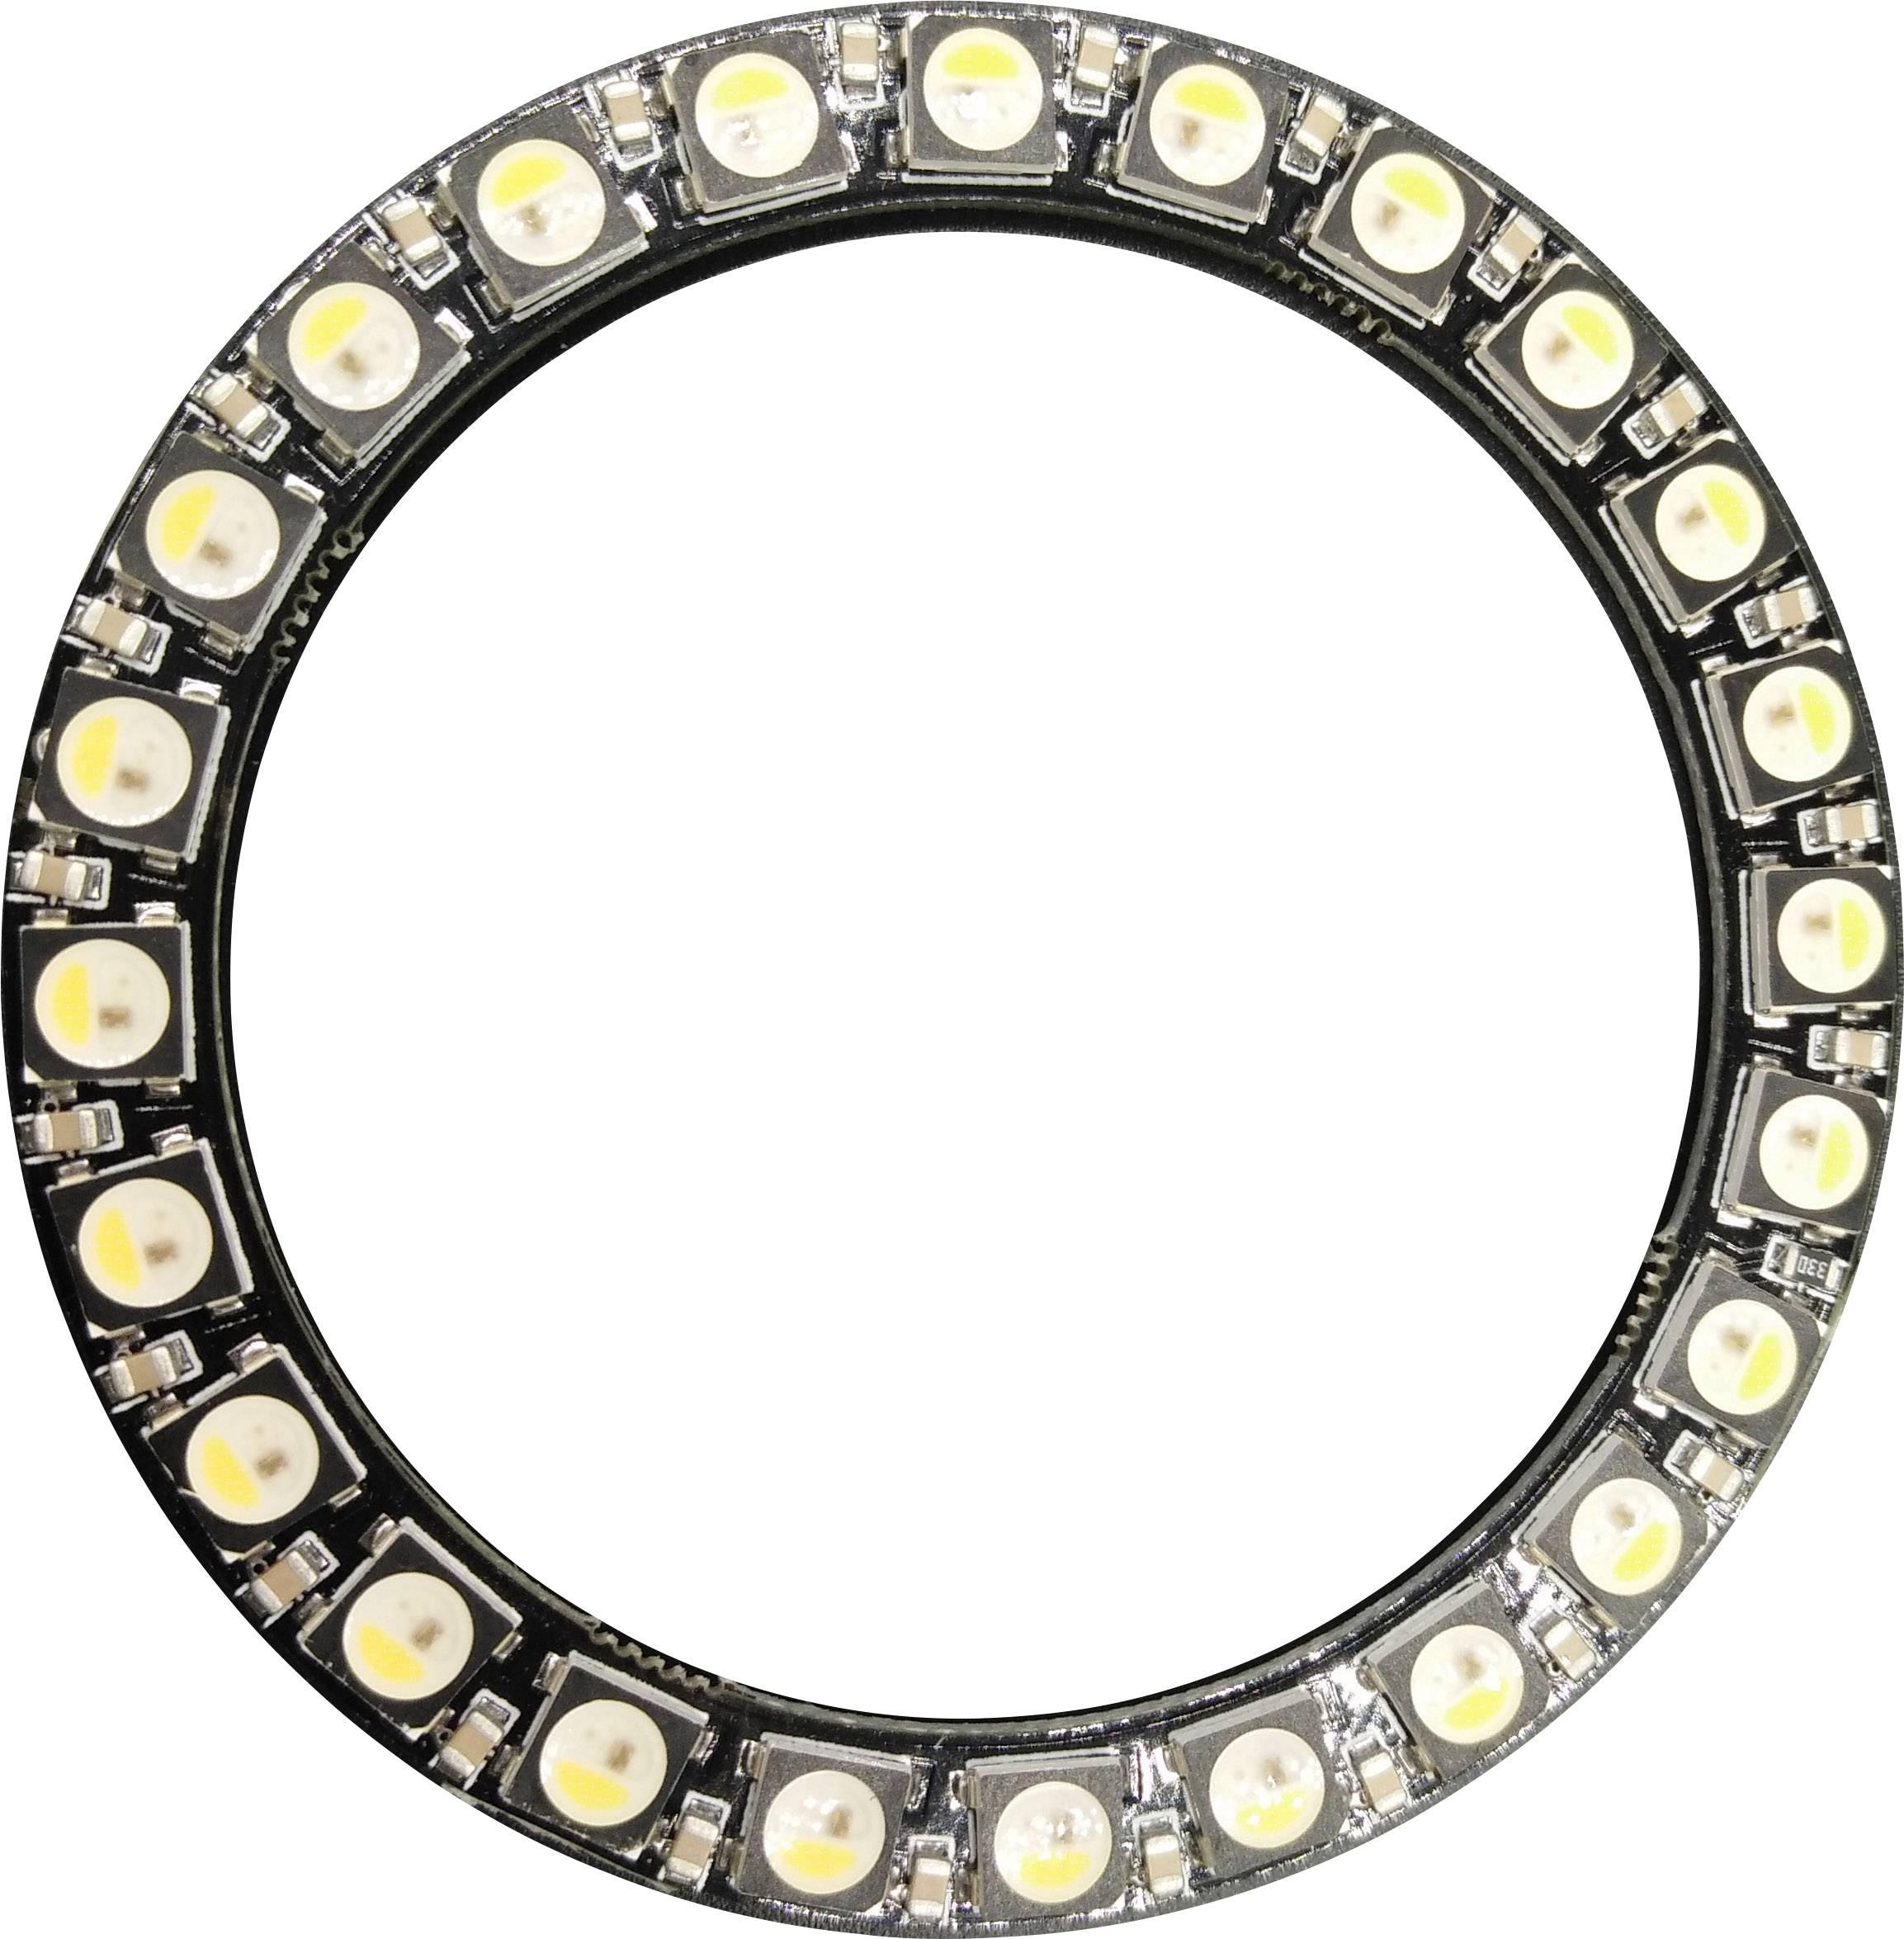 HighPower LED Thomsen LED-RING-24-RGB-SK, 120 °, 8 lm, 7.20 W, 5 V, RGBW